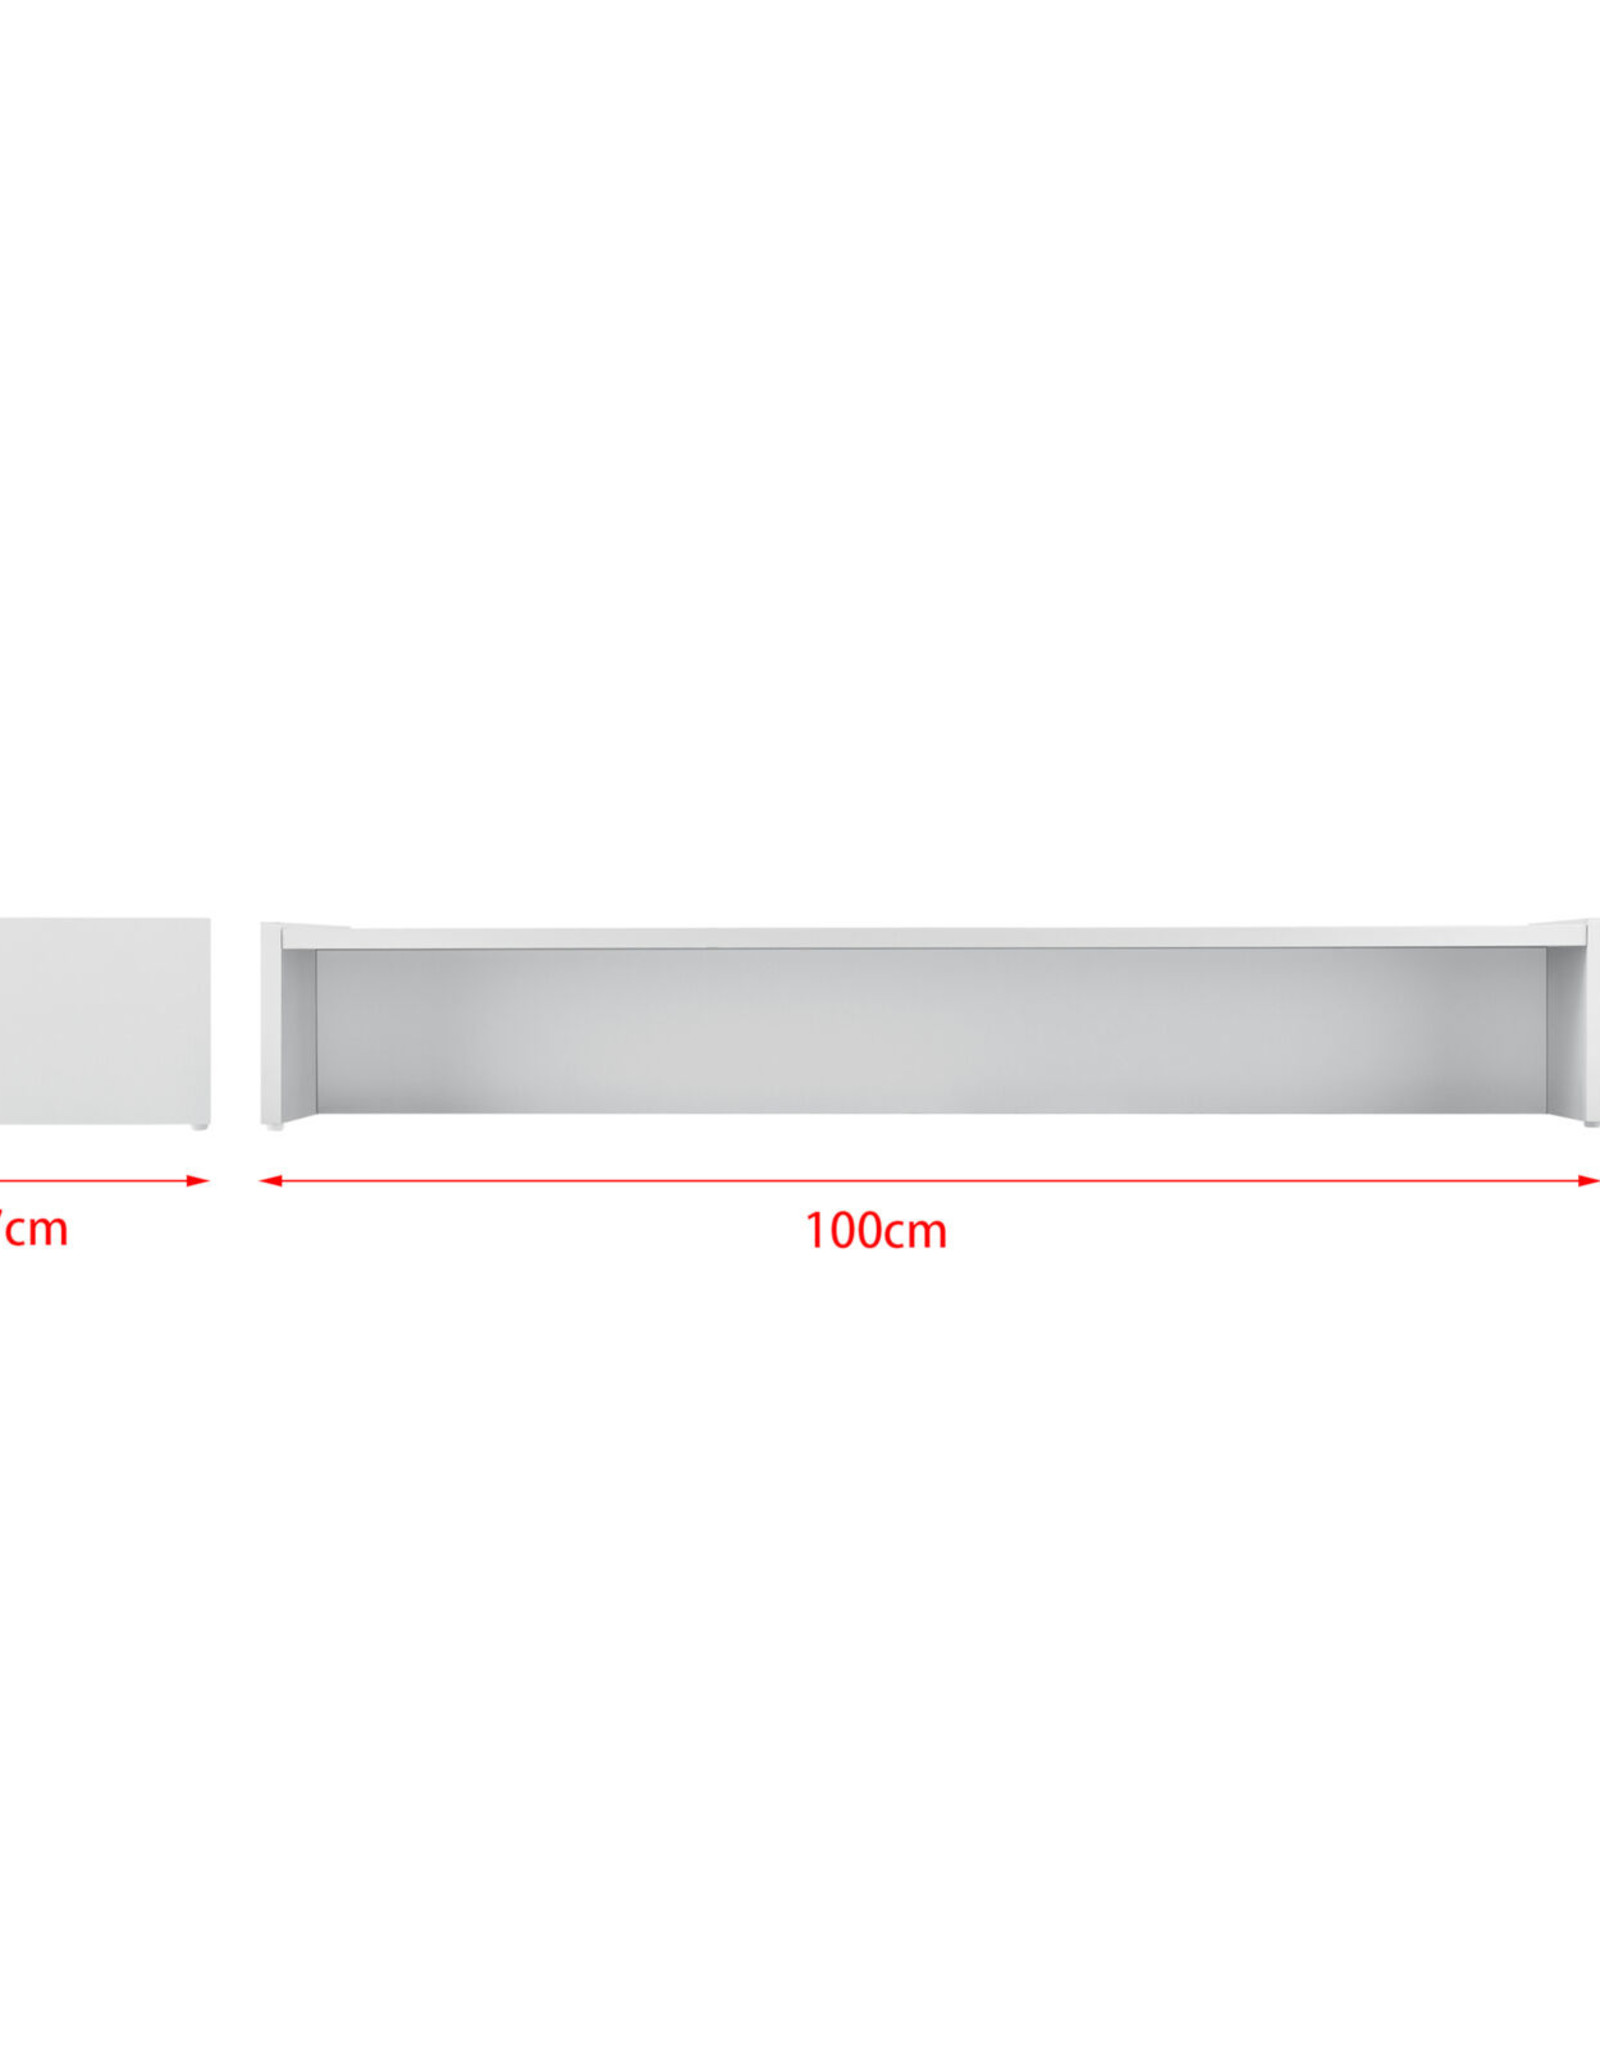 Monitorverhoging, monitorstandaard 100 x 27 x 15 cm